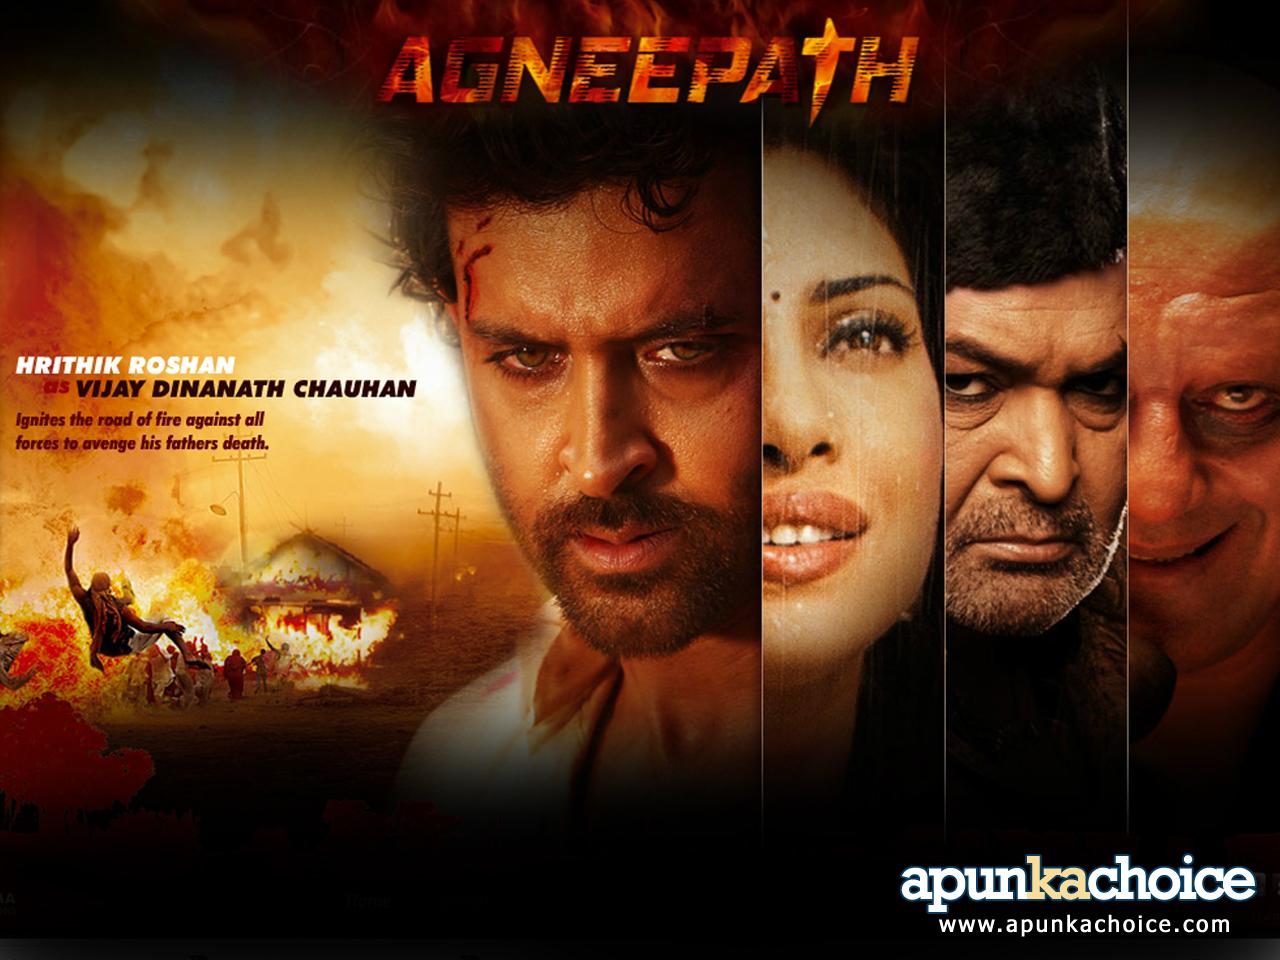 agneepath – hrithik roshan . released worldwide | hollywwod